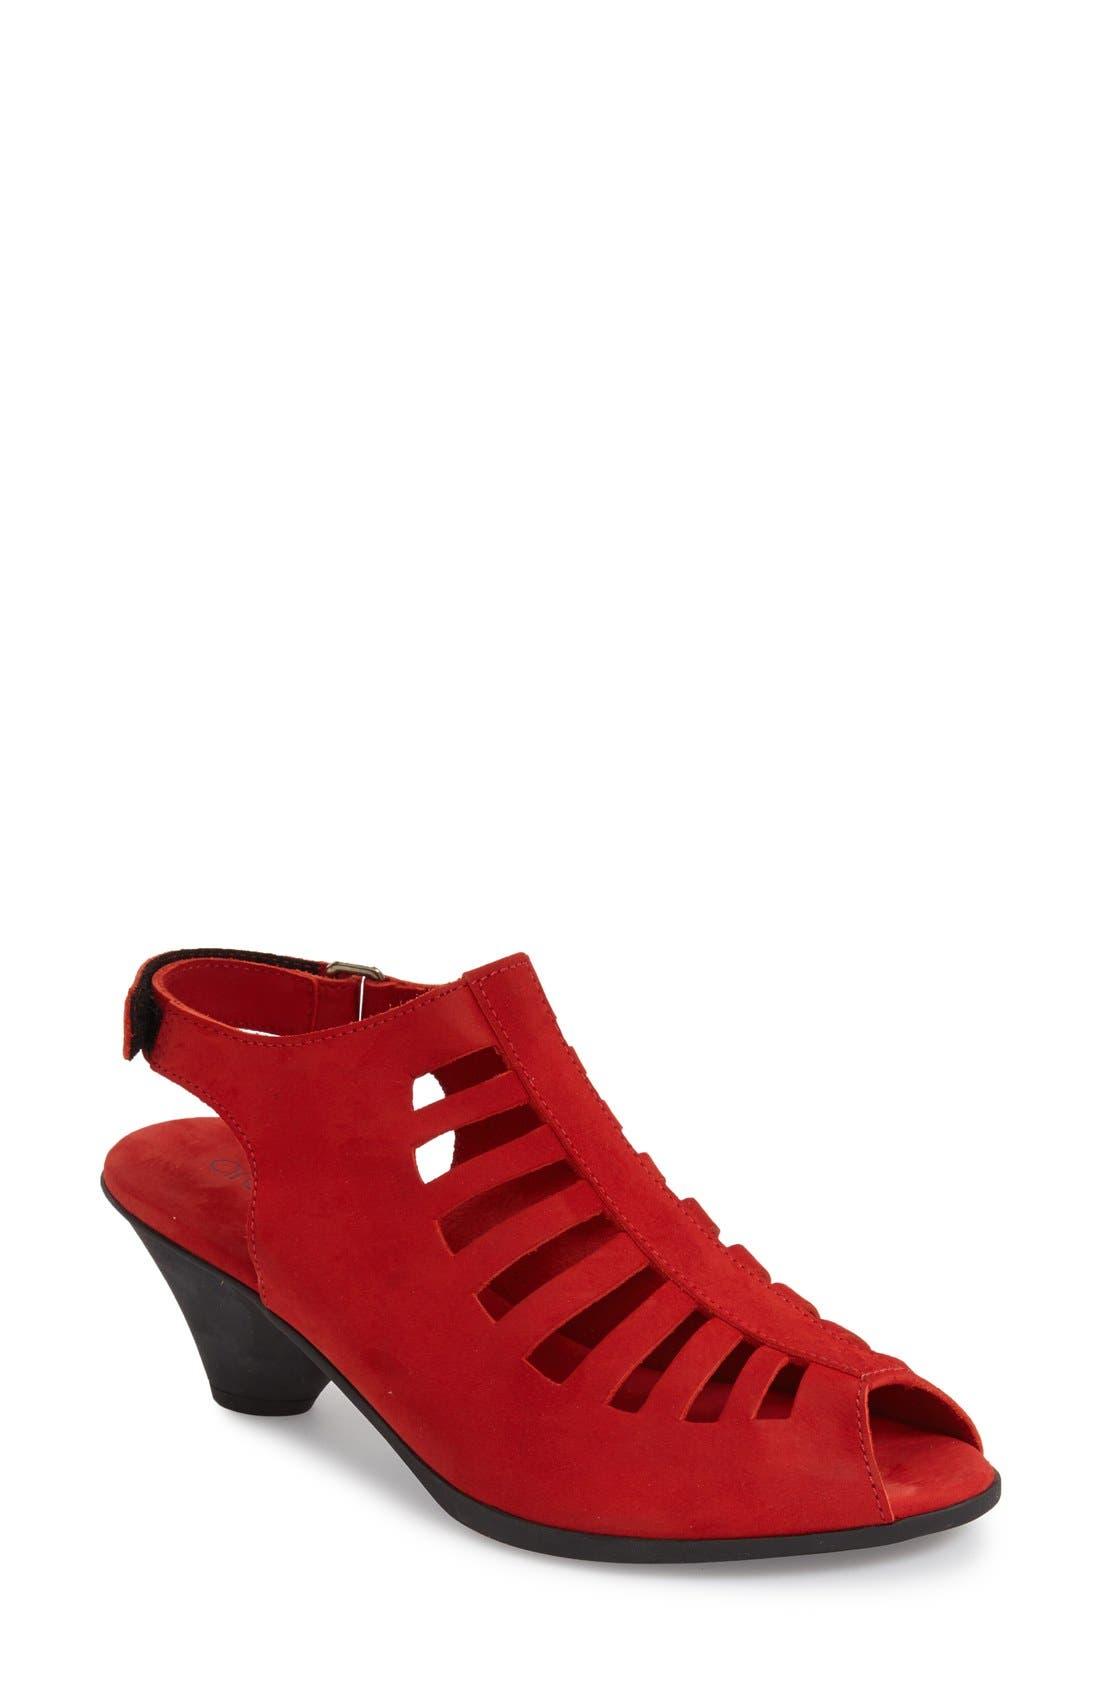 'Exor' Sandal,                         Main,                         color,